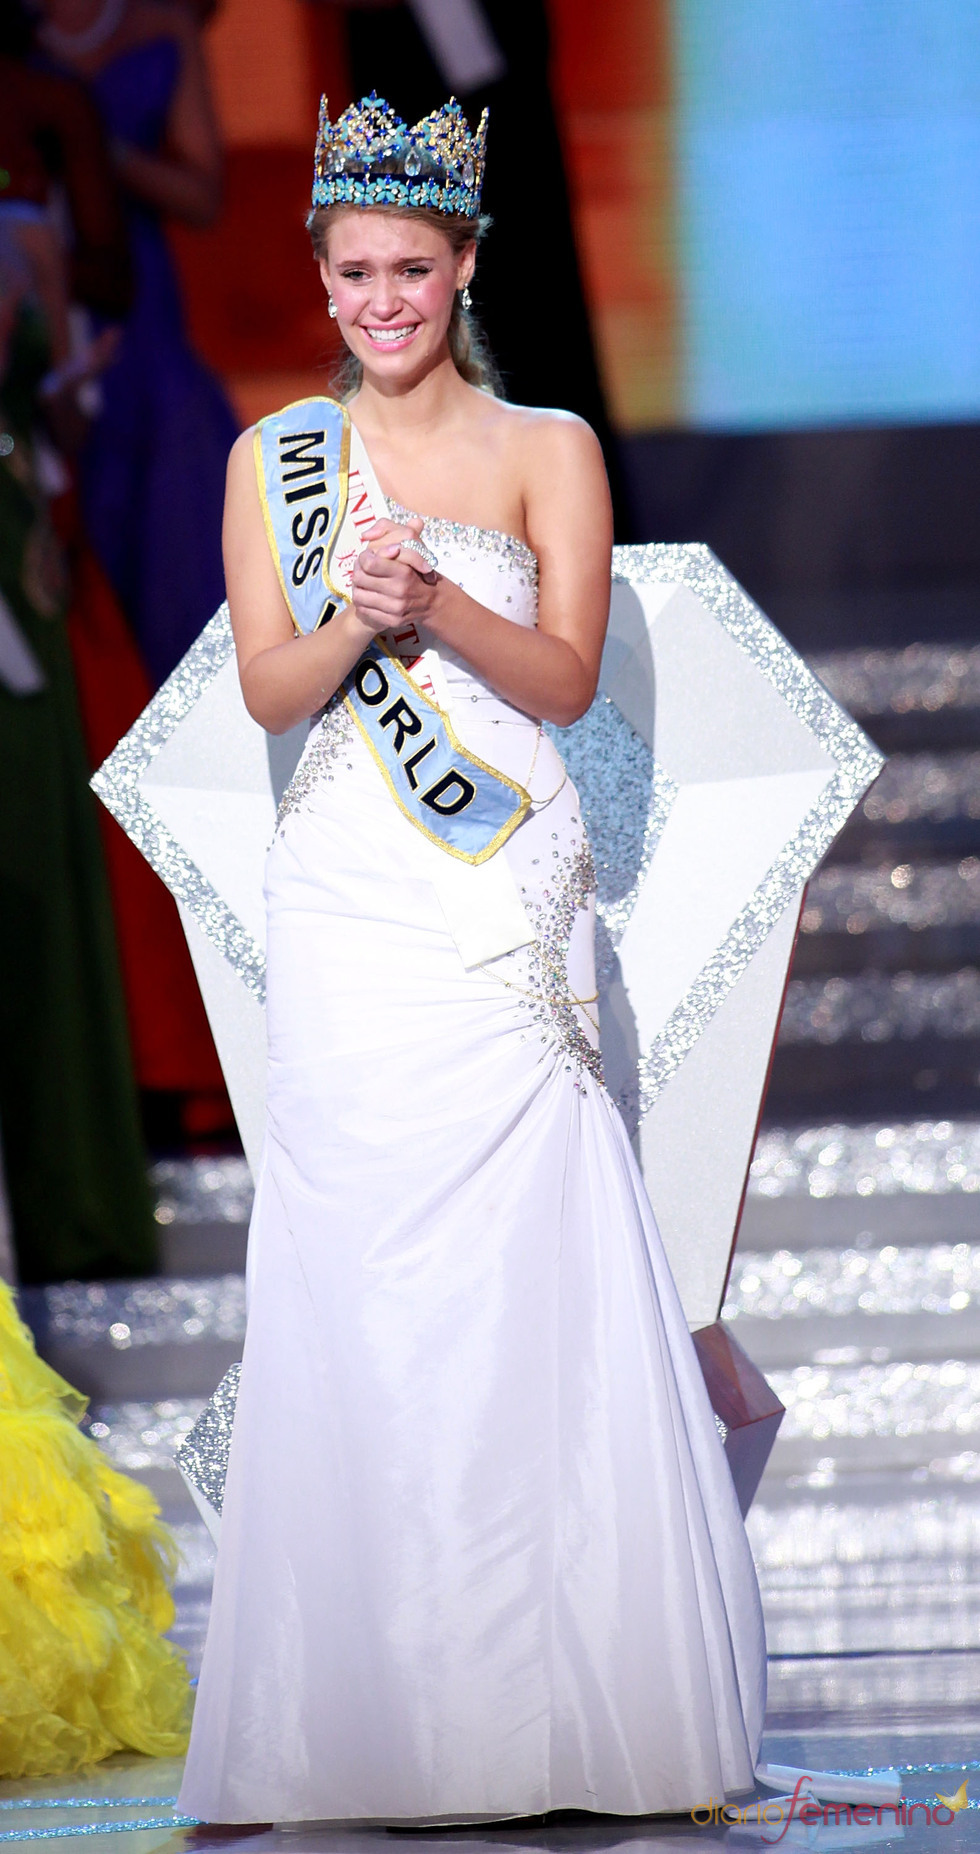 Alexandria Mills, Miss Mundo 2010